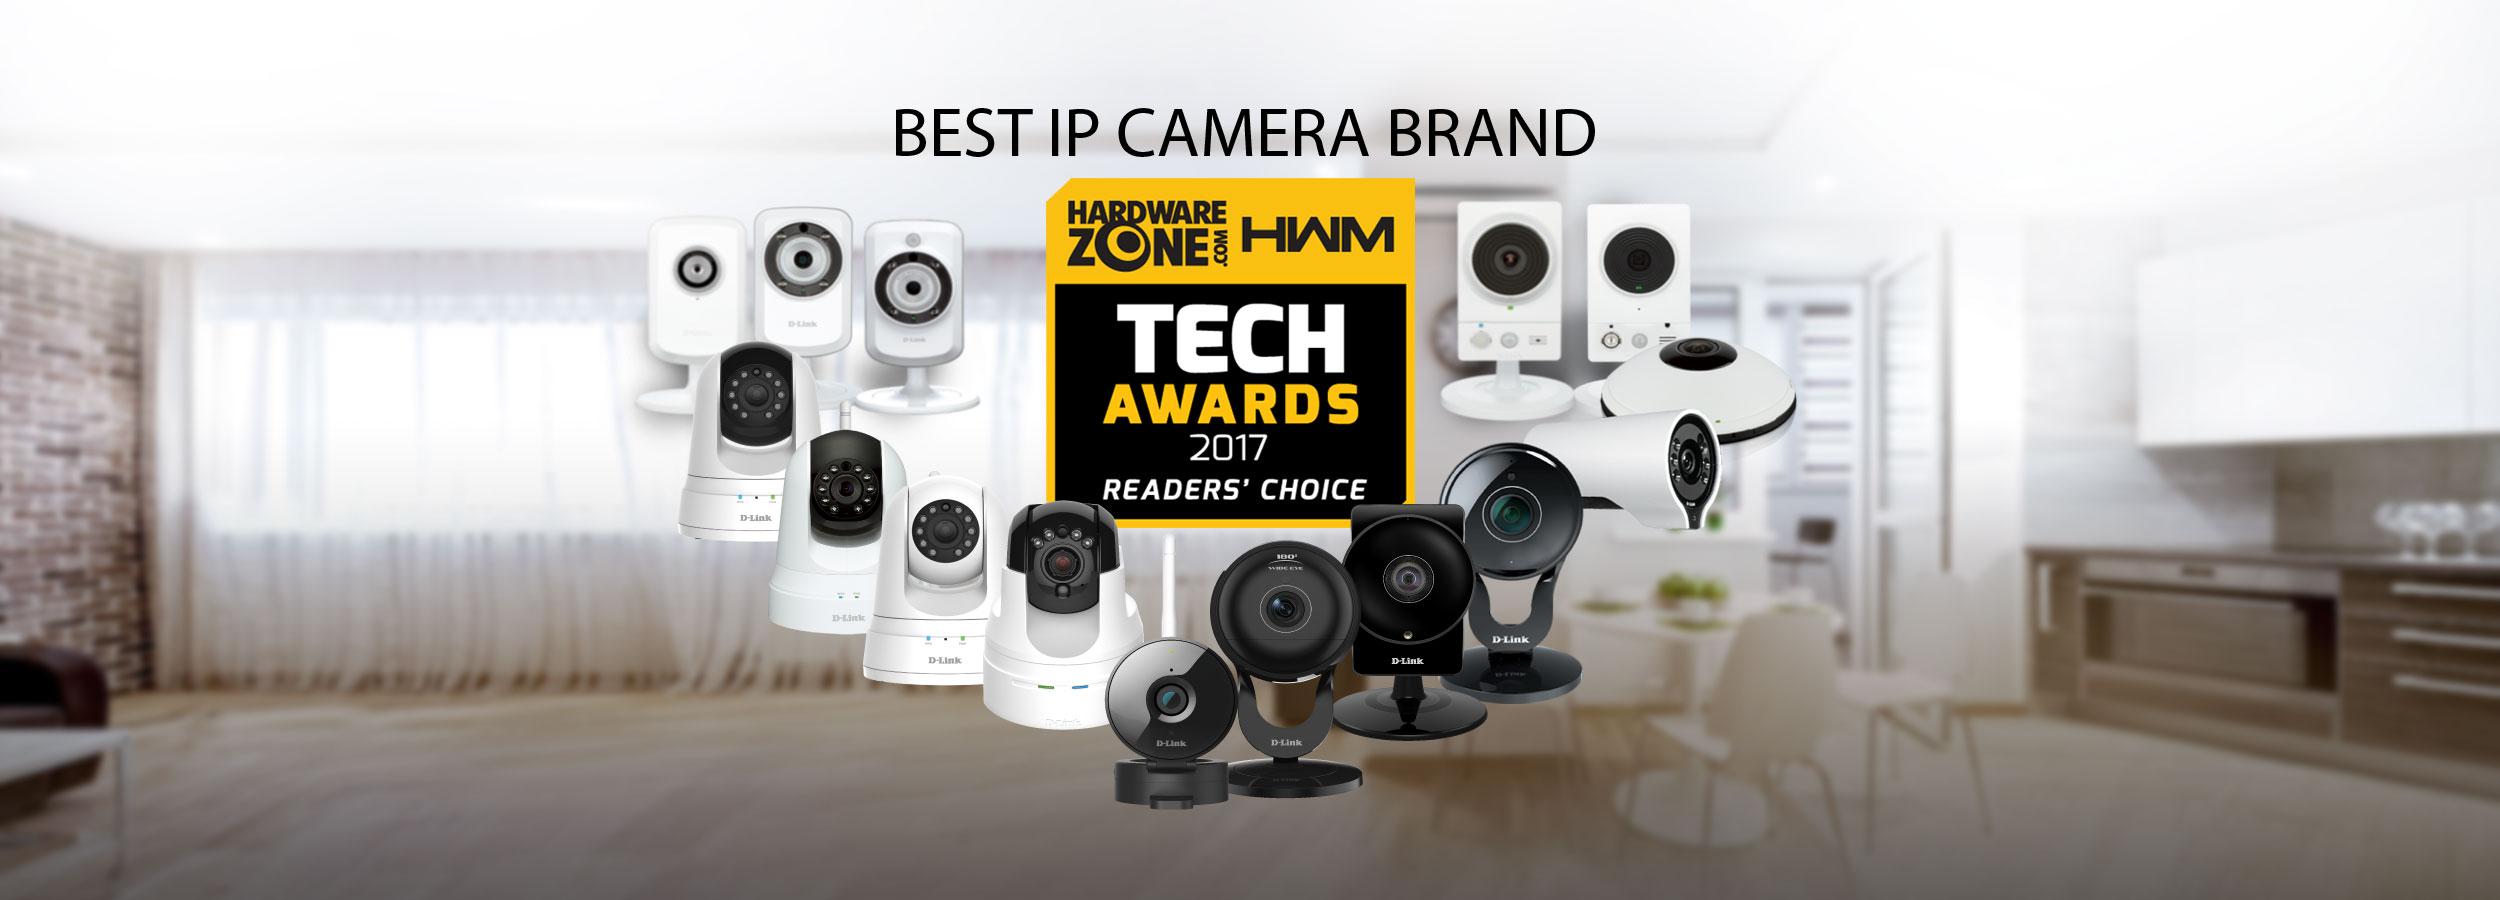 BestIPCameraAward-DLinkSingapore1